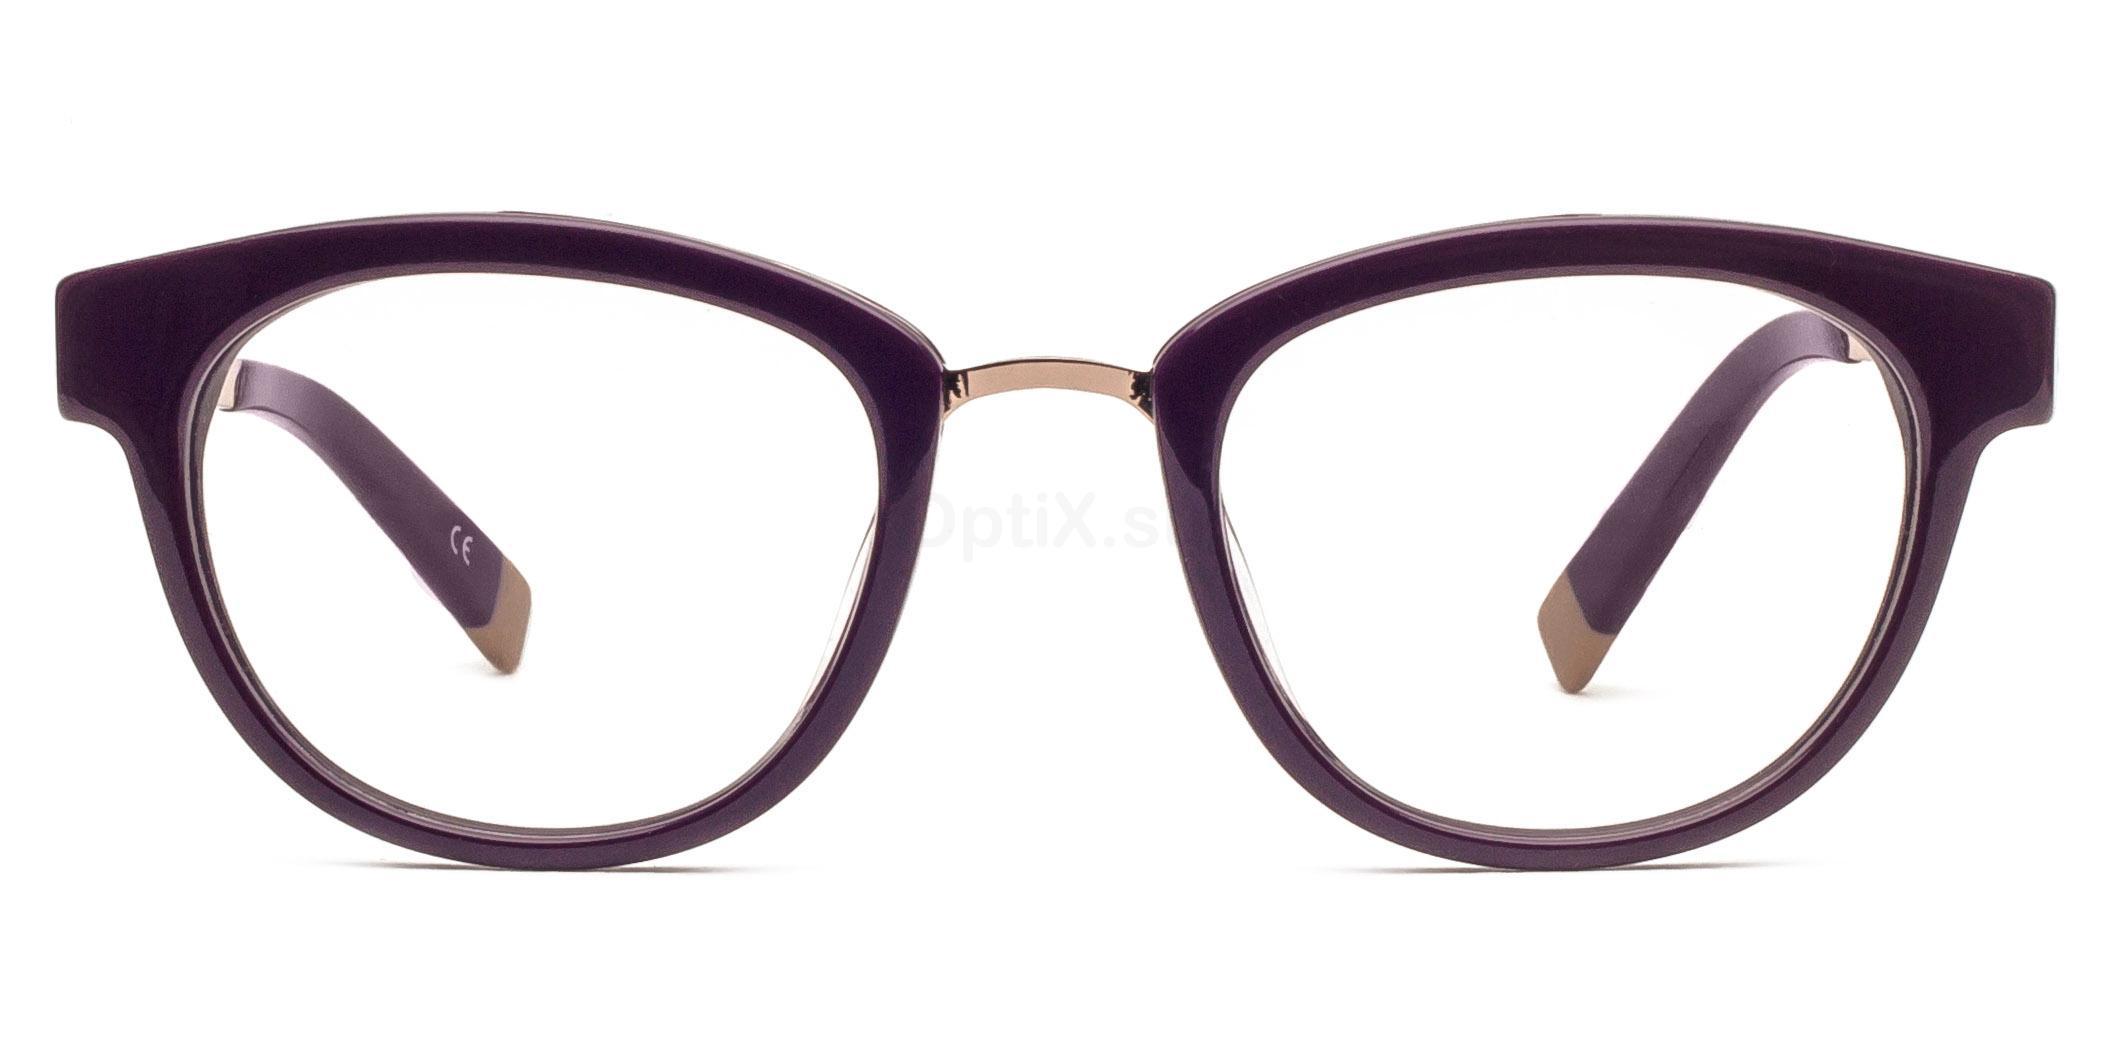 C3 SRA143 Glasses, Infinity